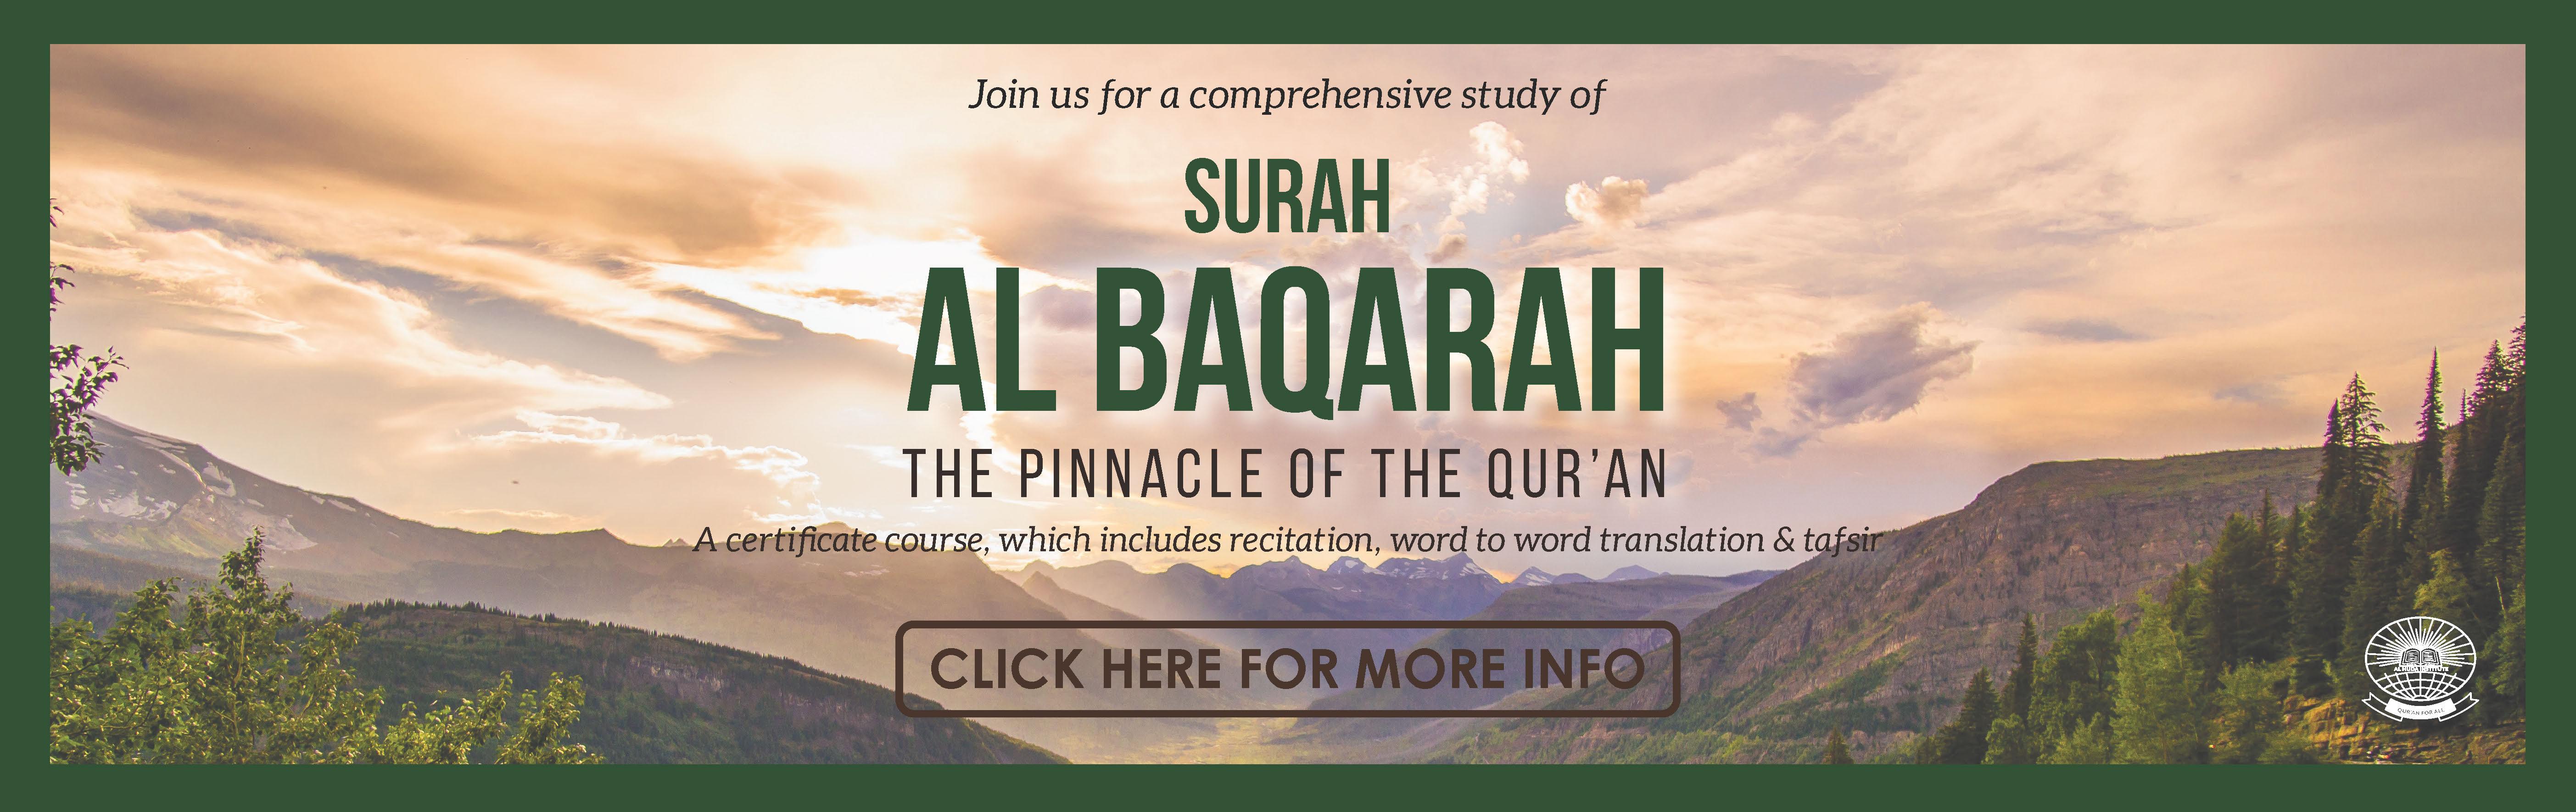 Quran For All - Gambar Islami